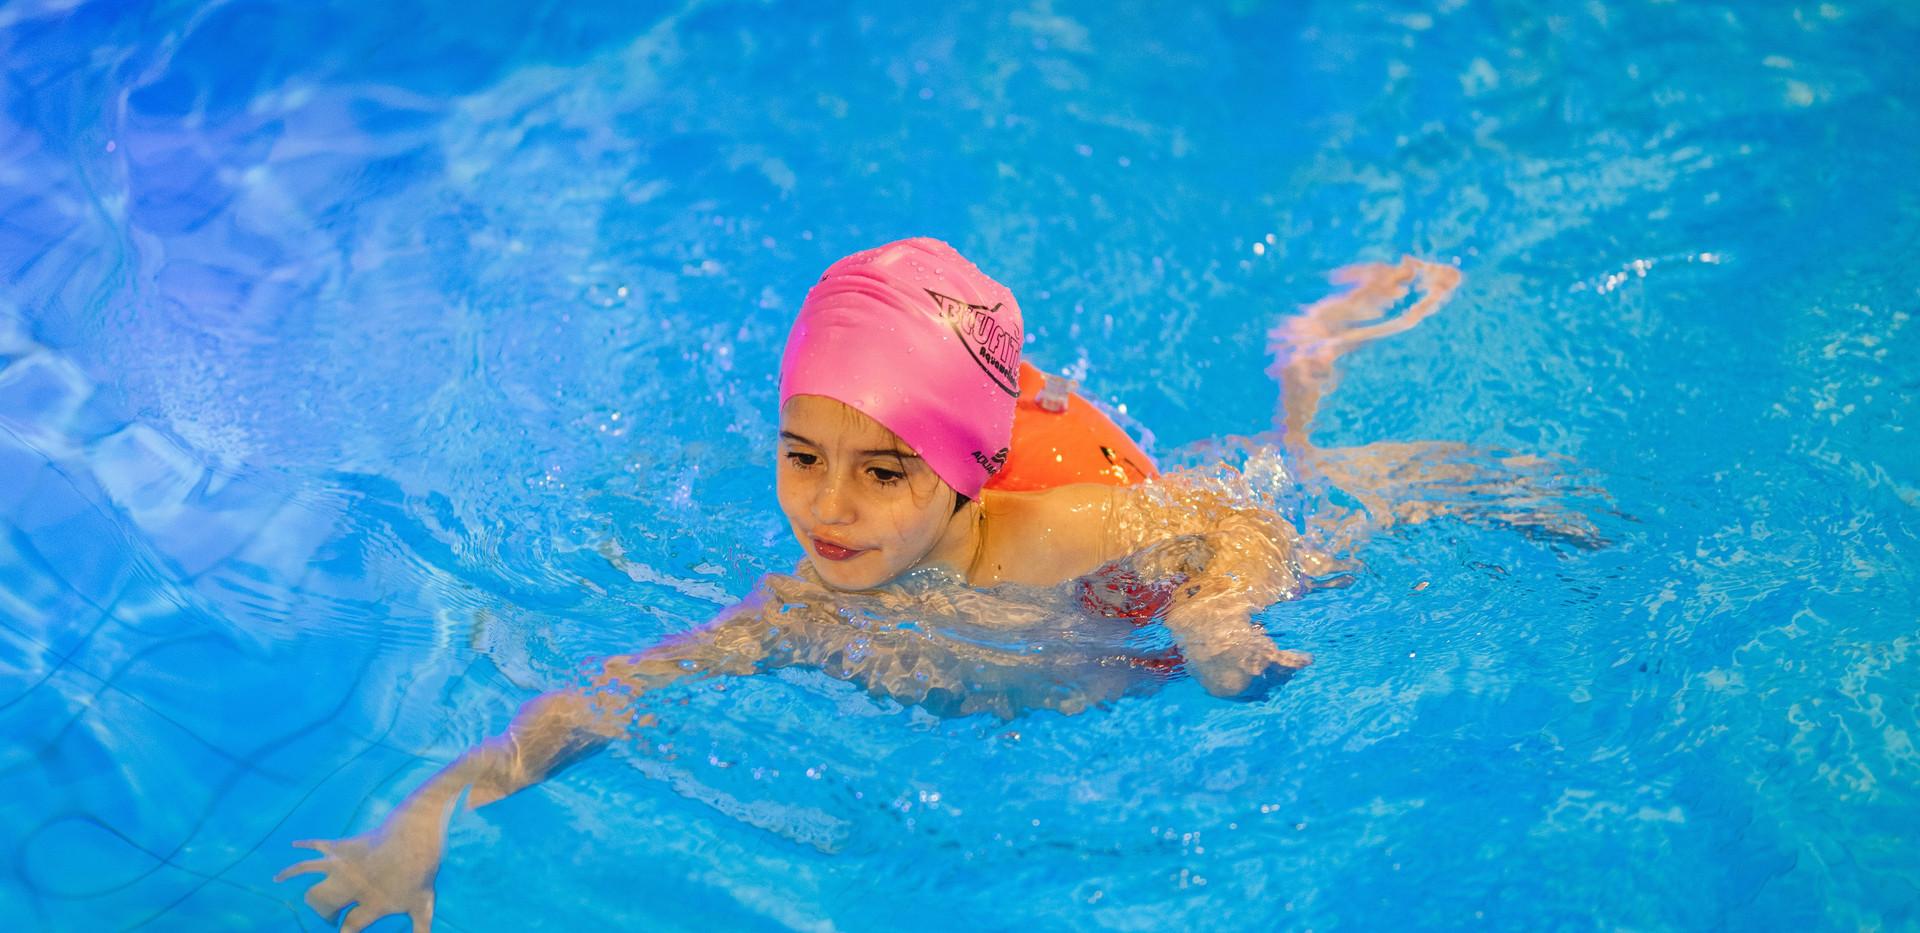 Scuola Nuoto